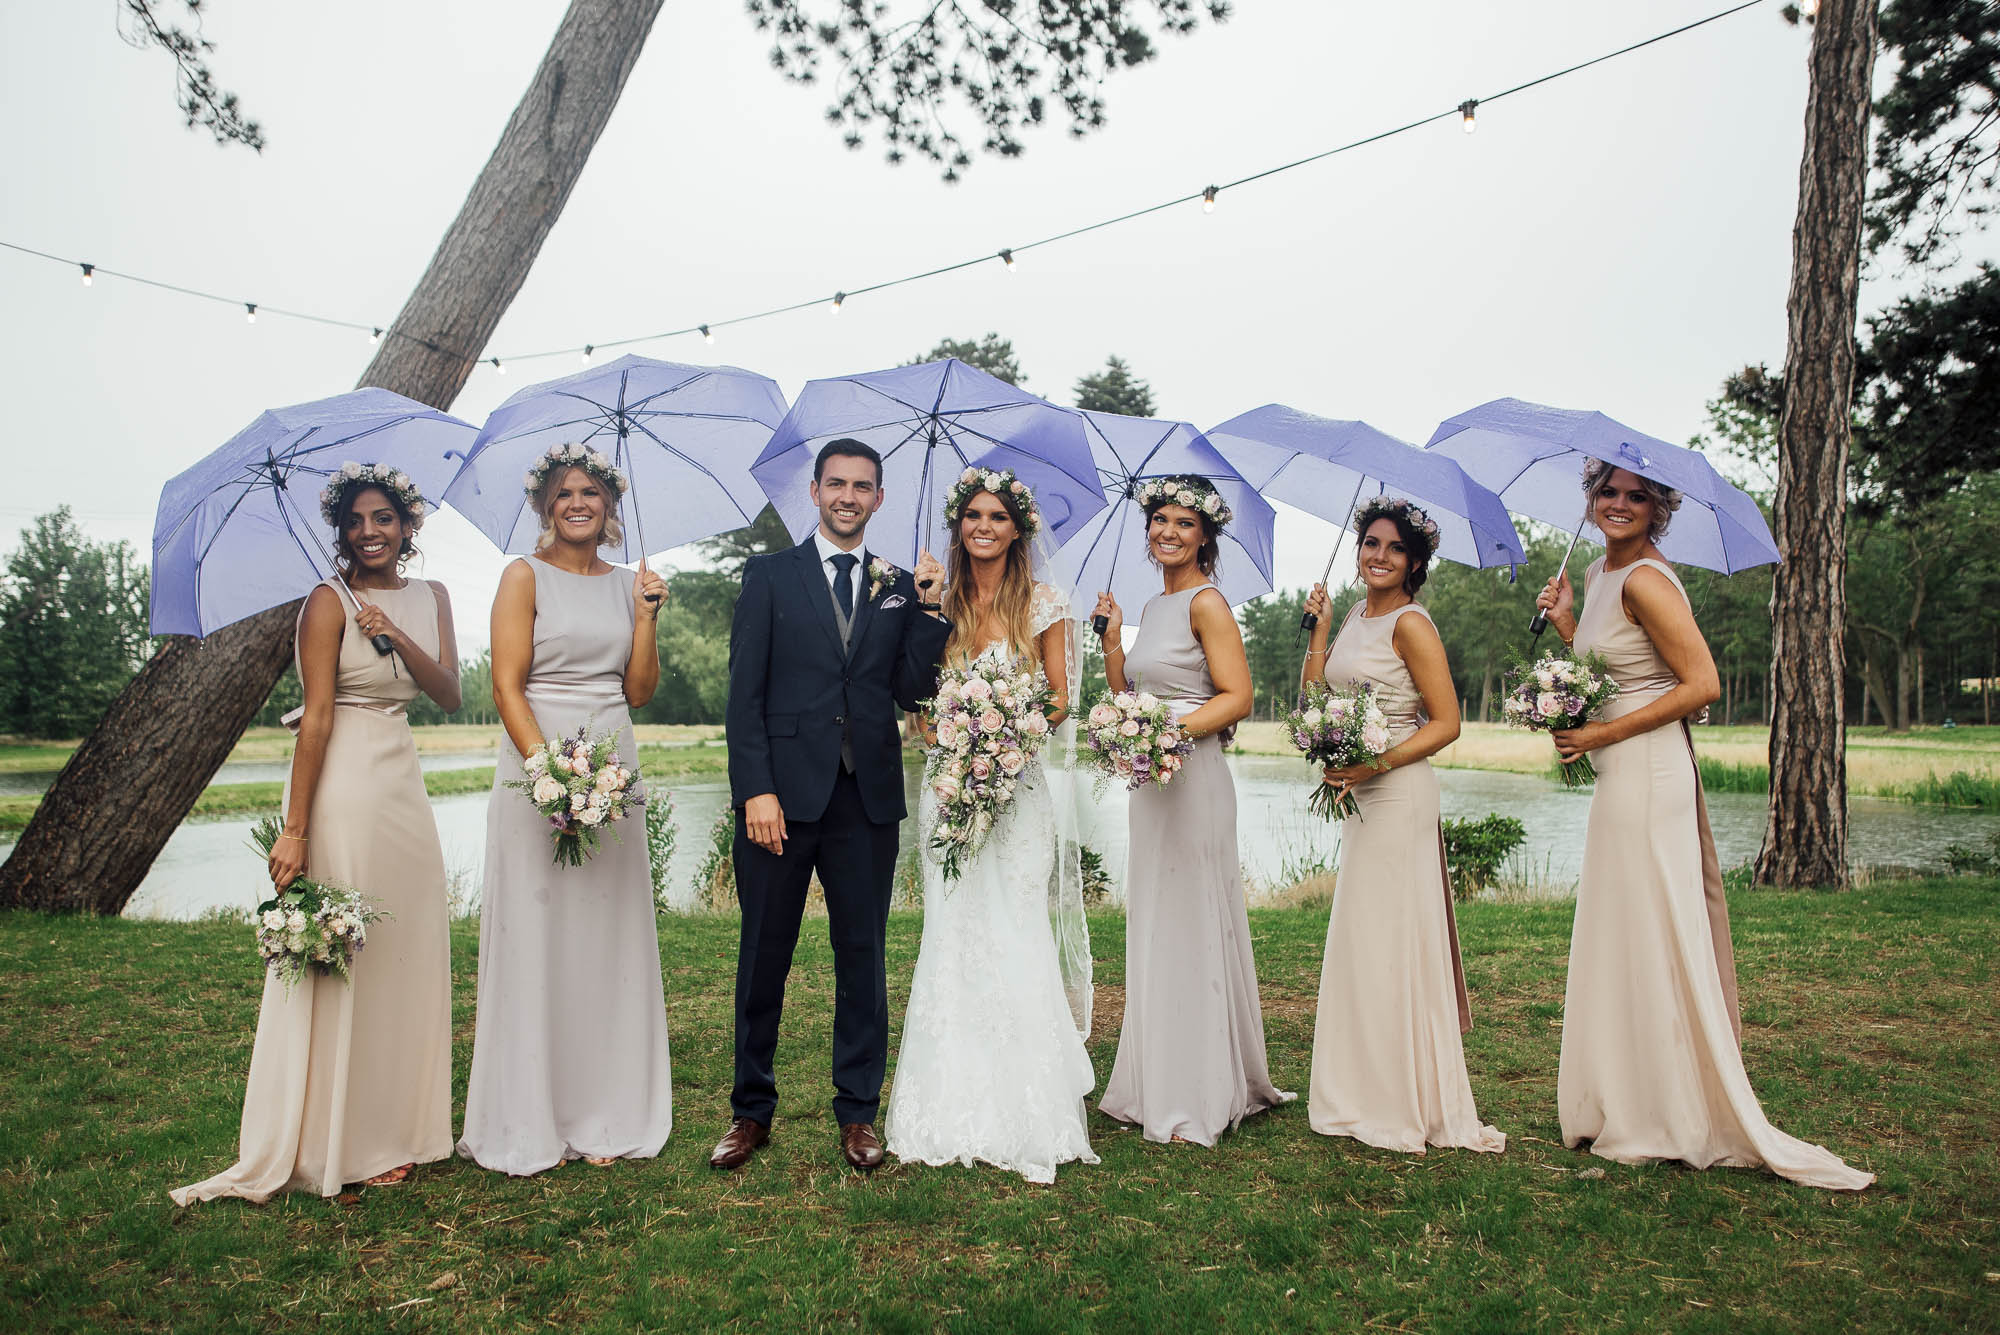 Bride & Groom with bridesmaids holding umbrellas on a rainy wedding day